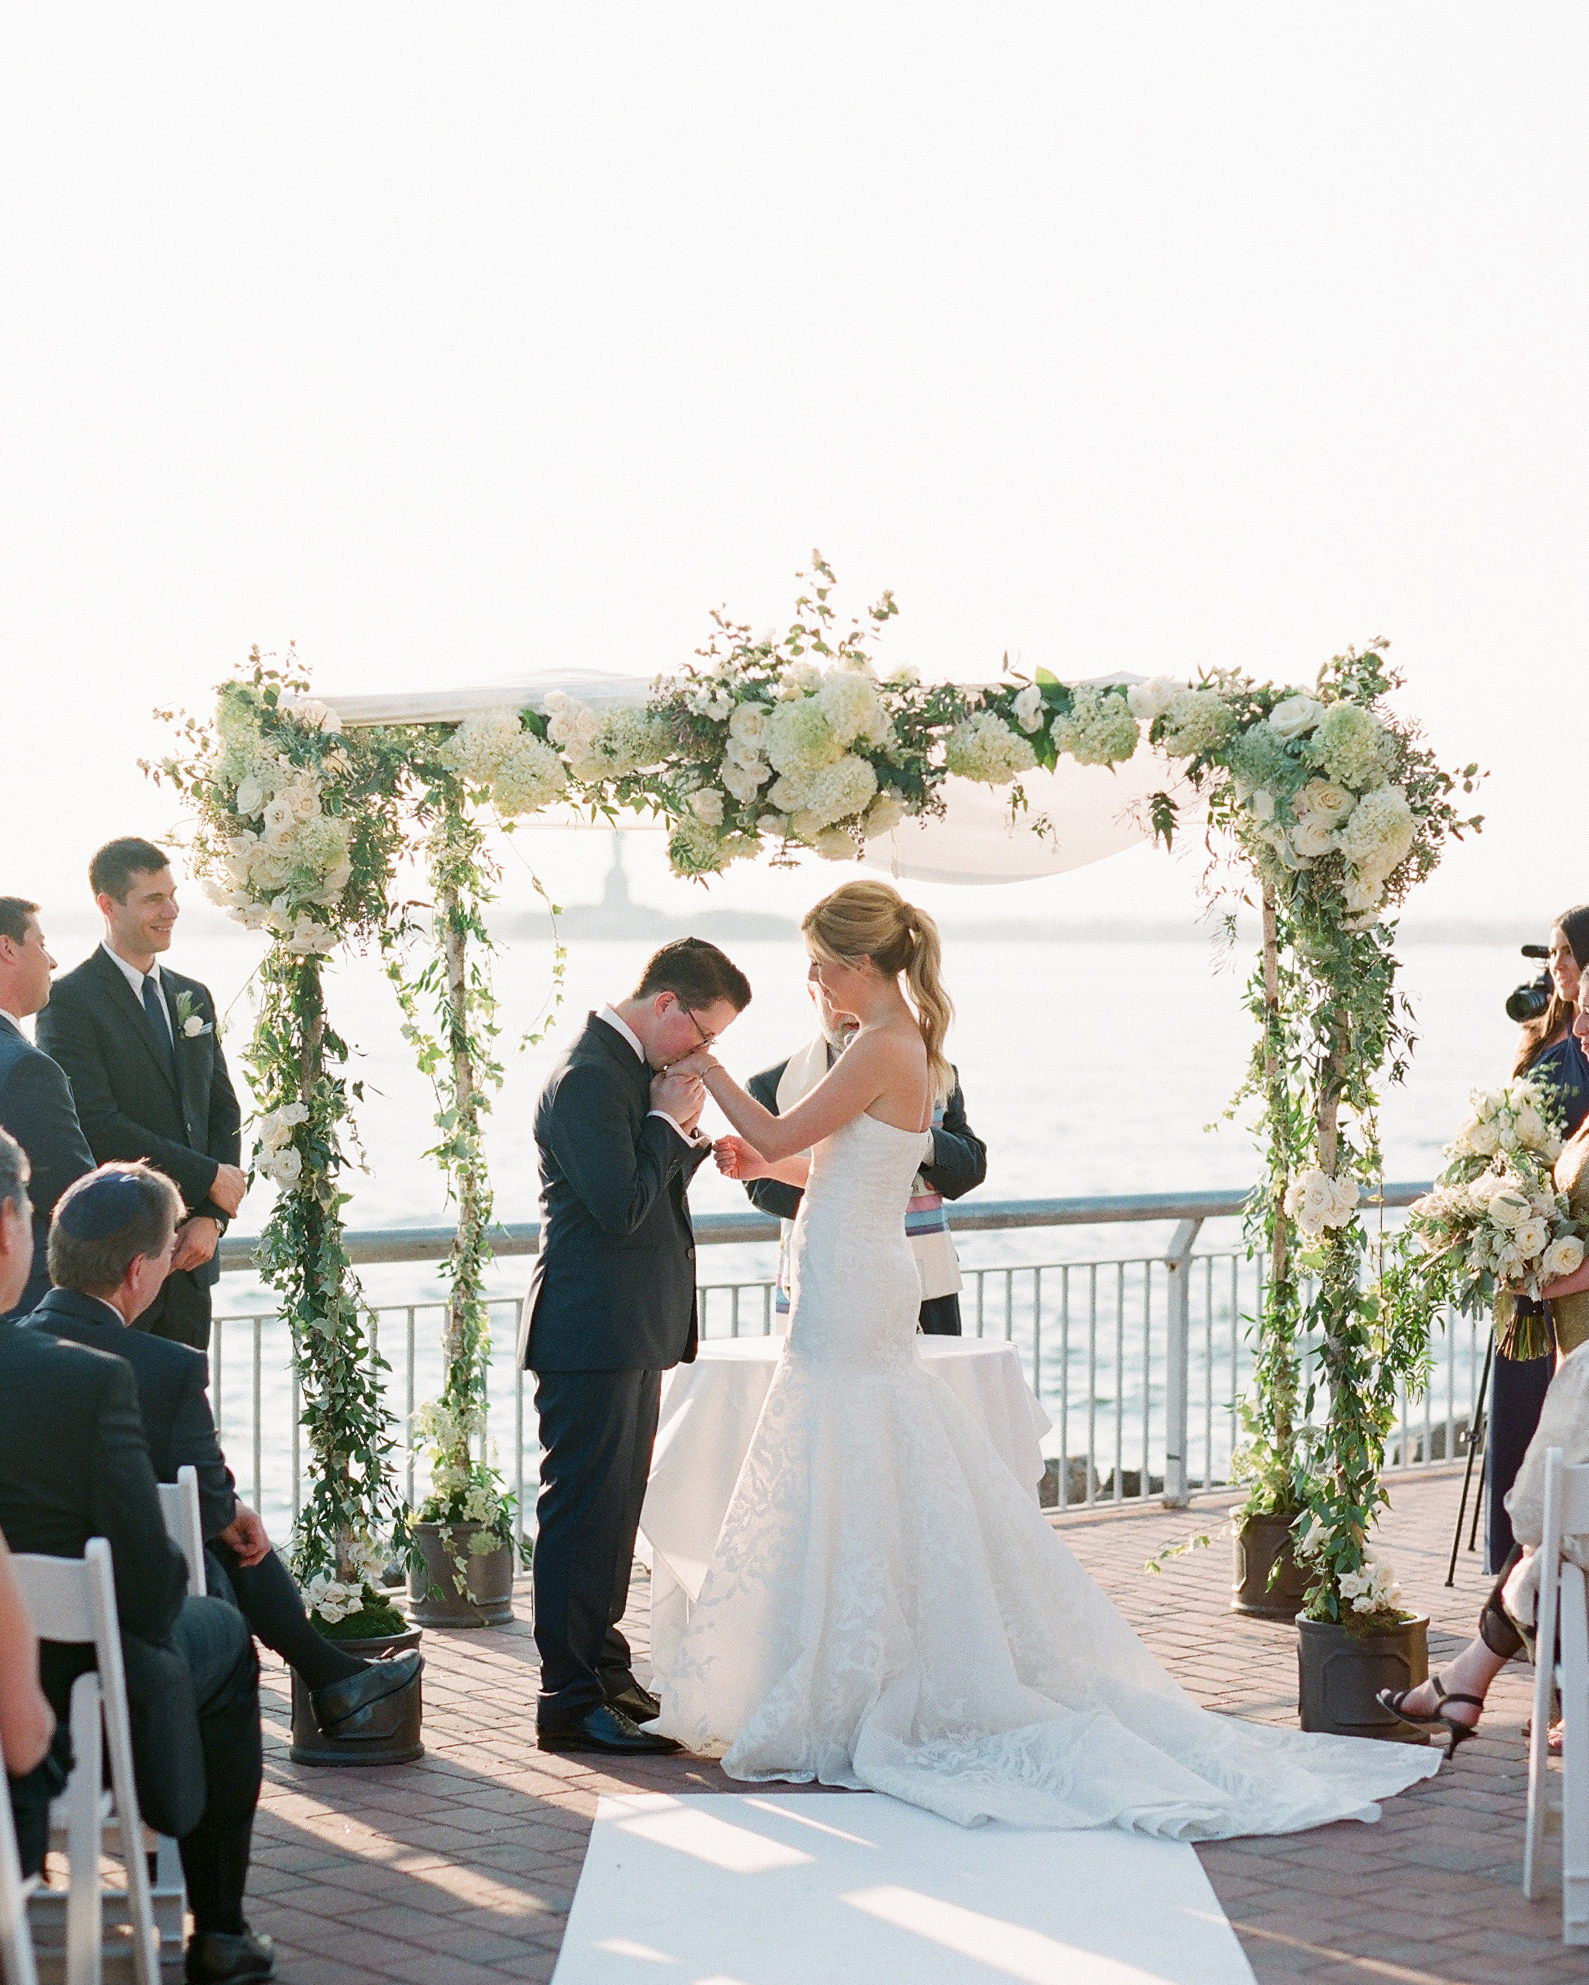 amy-bob-wedding-ceremony-0642-s111884-0715.jpg